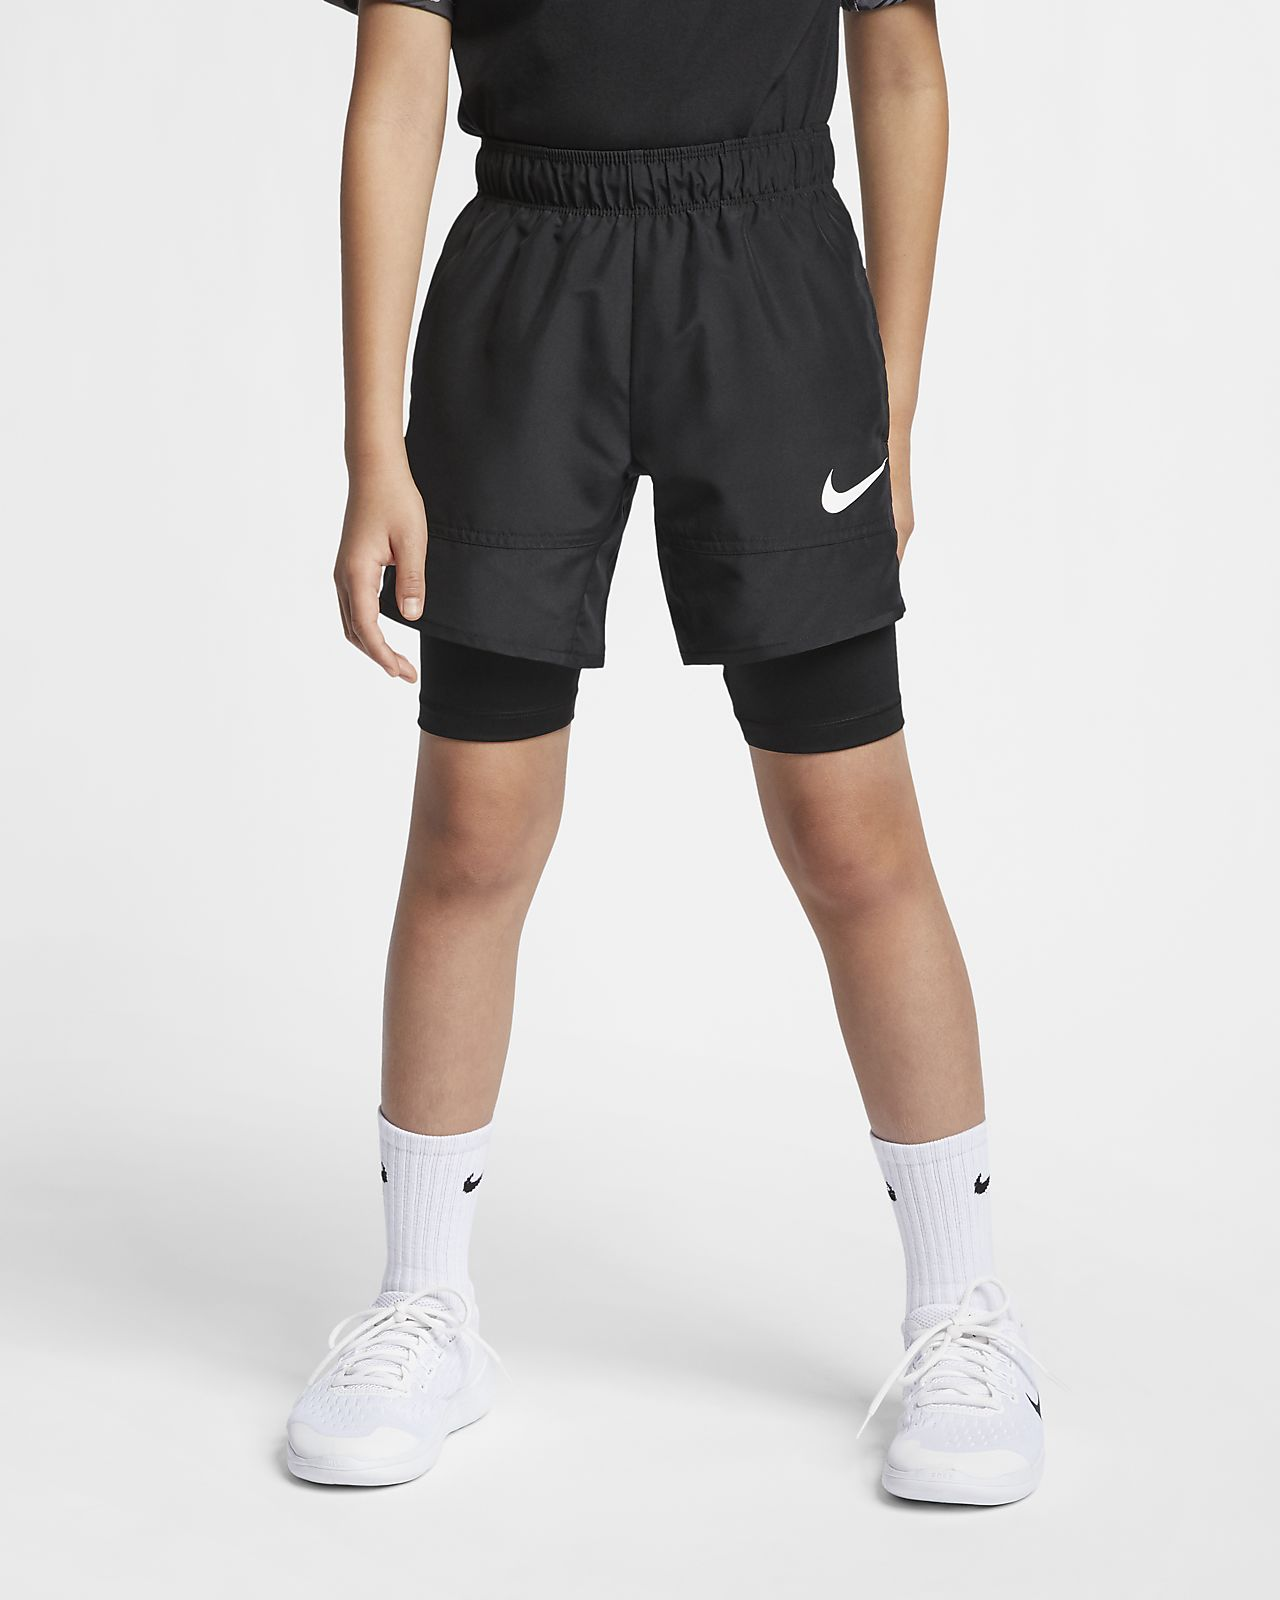 Nike Hybrid-Trainingsshorts für ältere Kinder (Jungen)